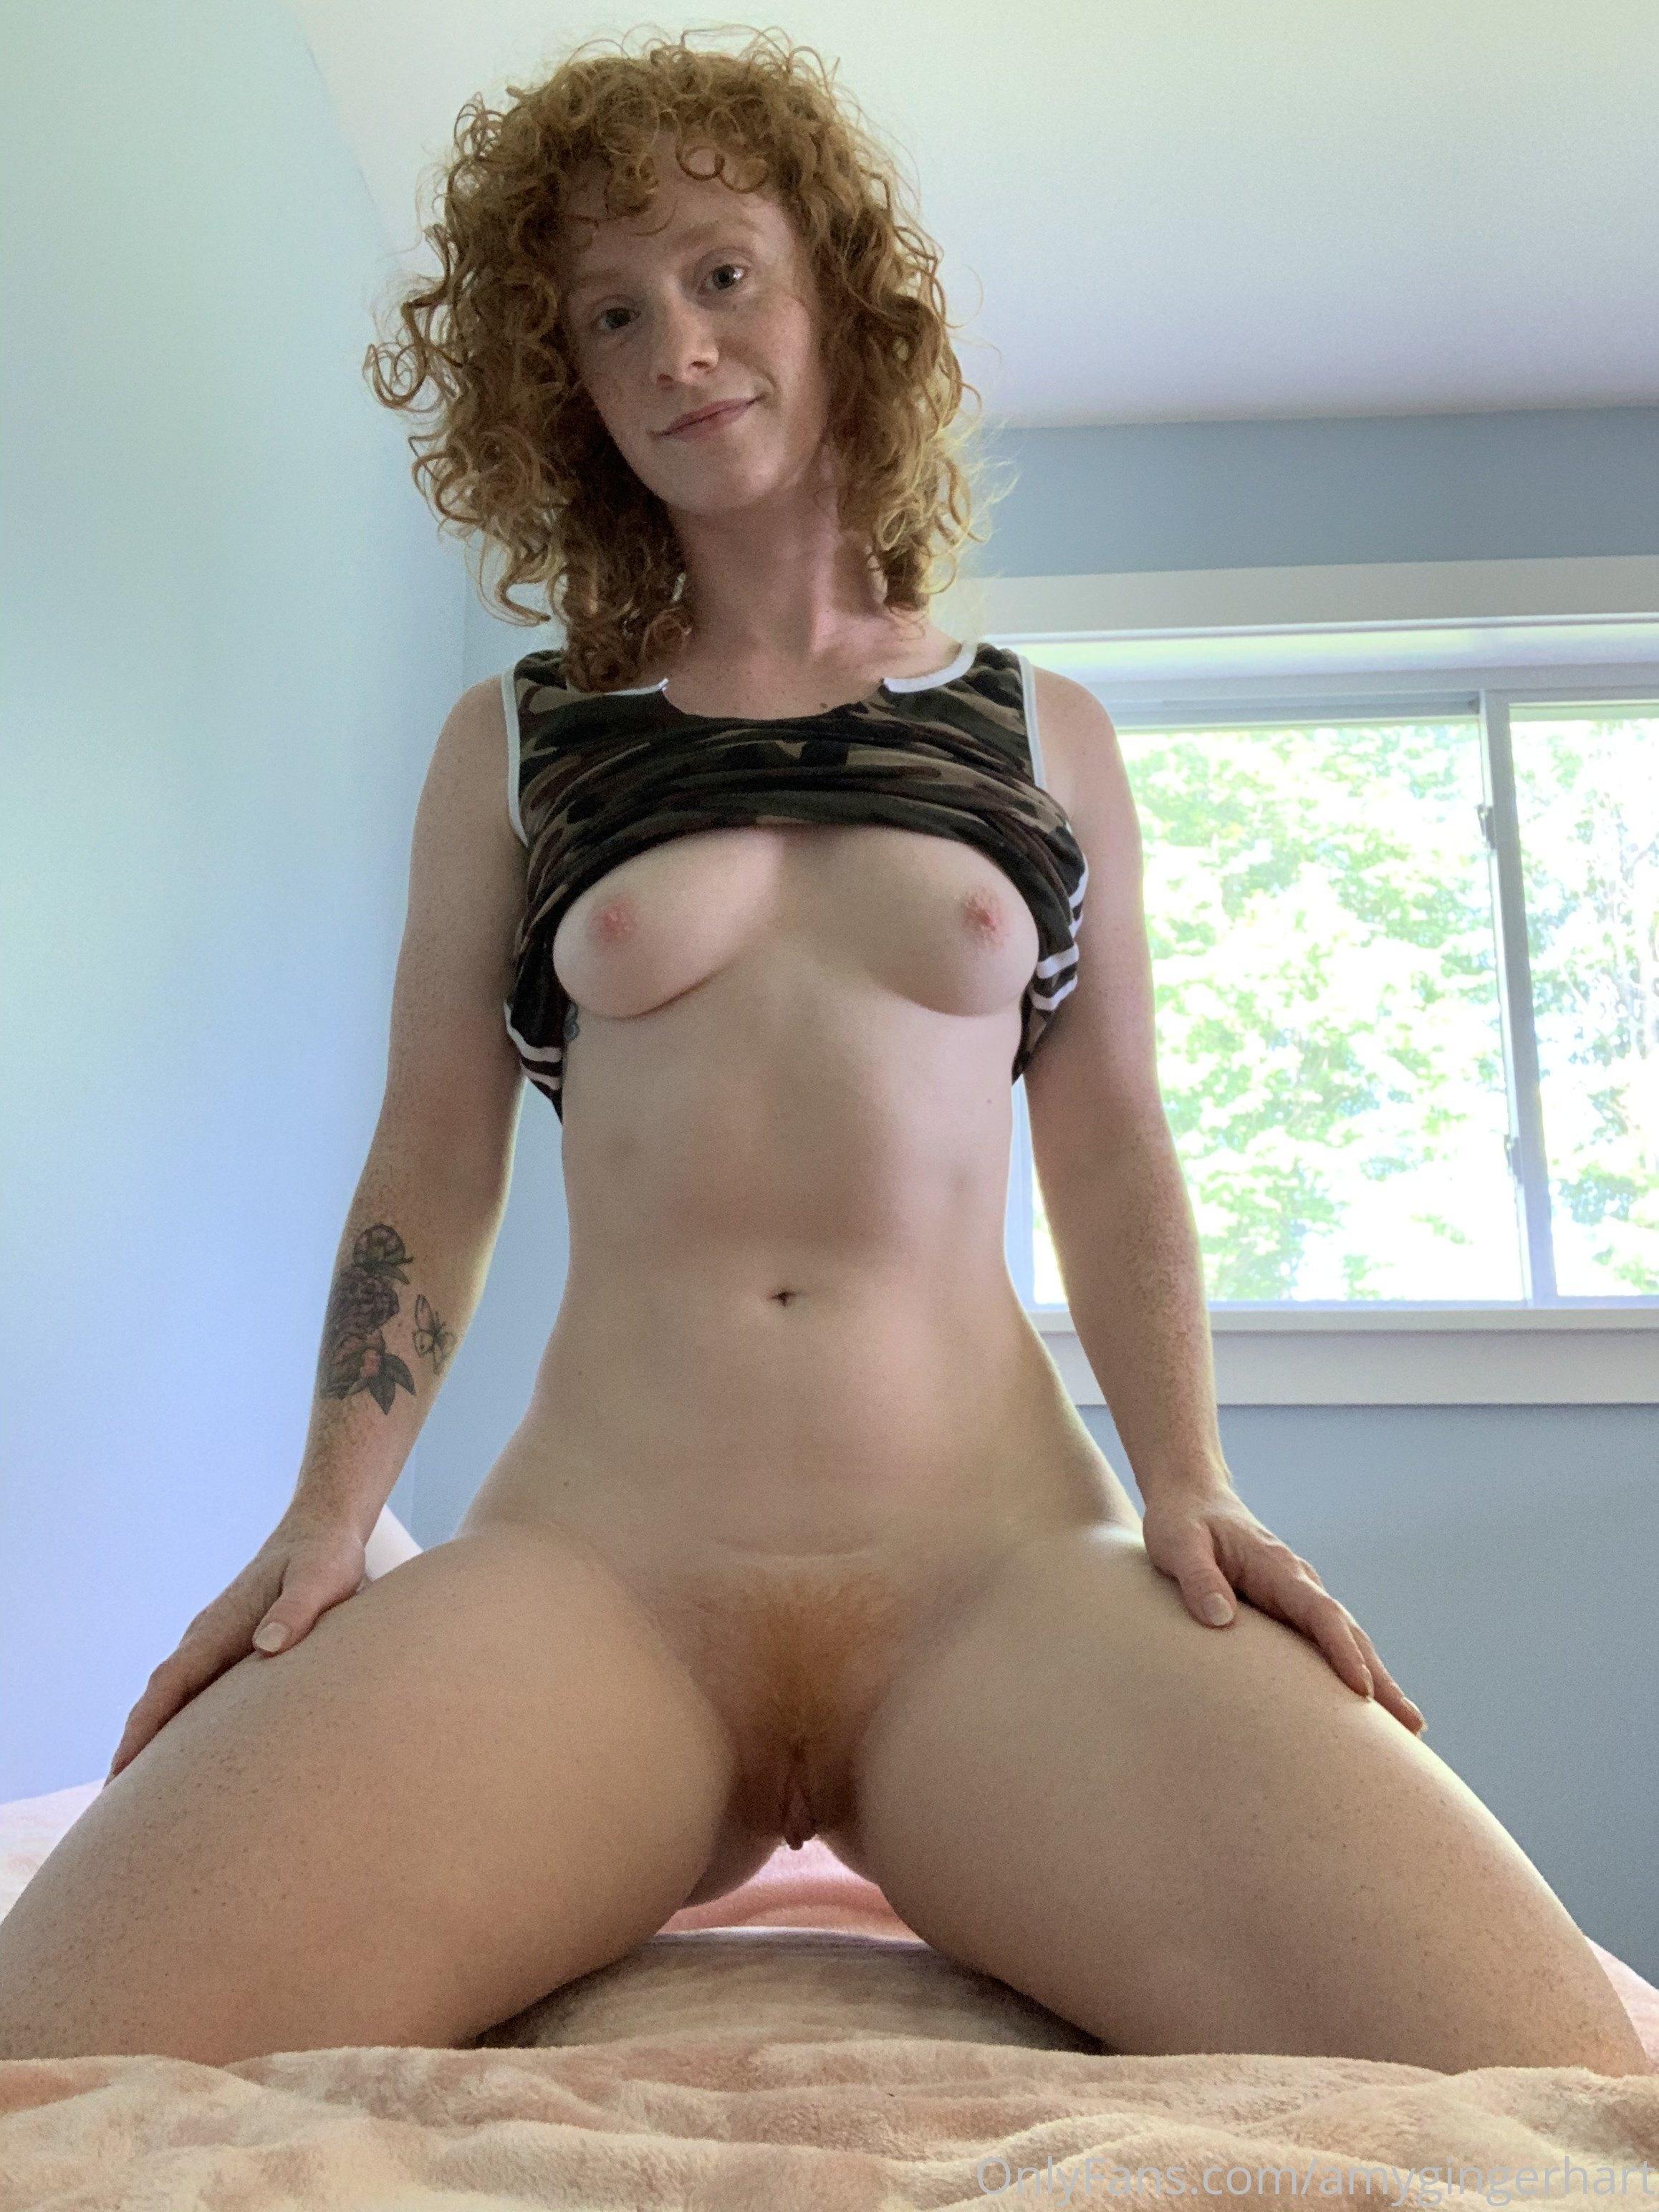 Amy Hart, Amygingerhart, Onlyfans 0332